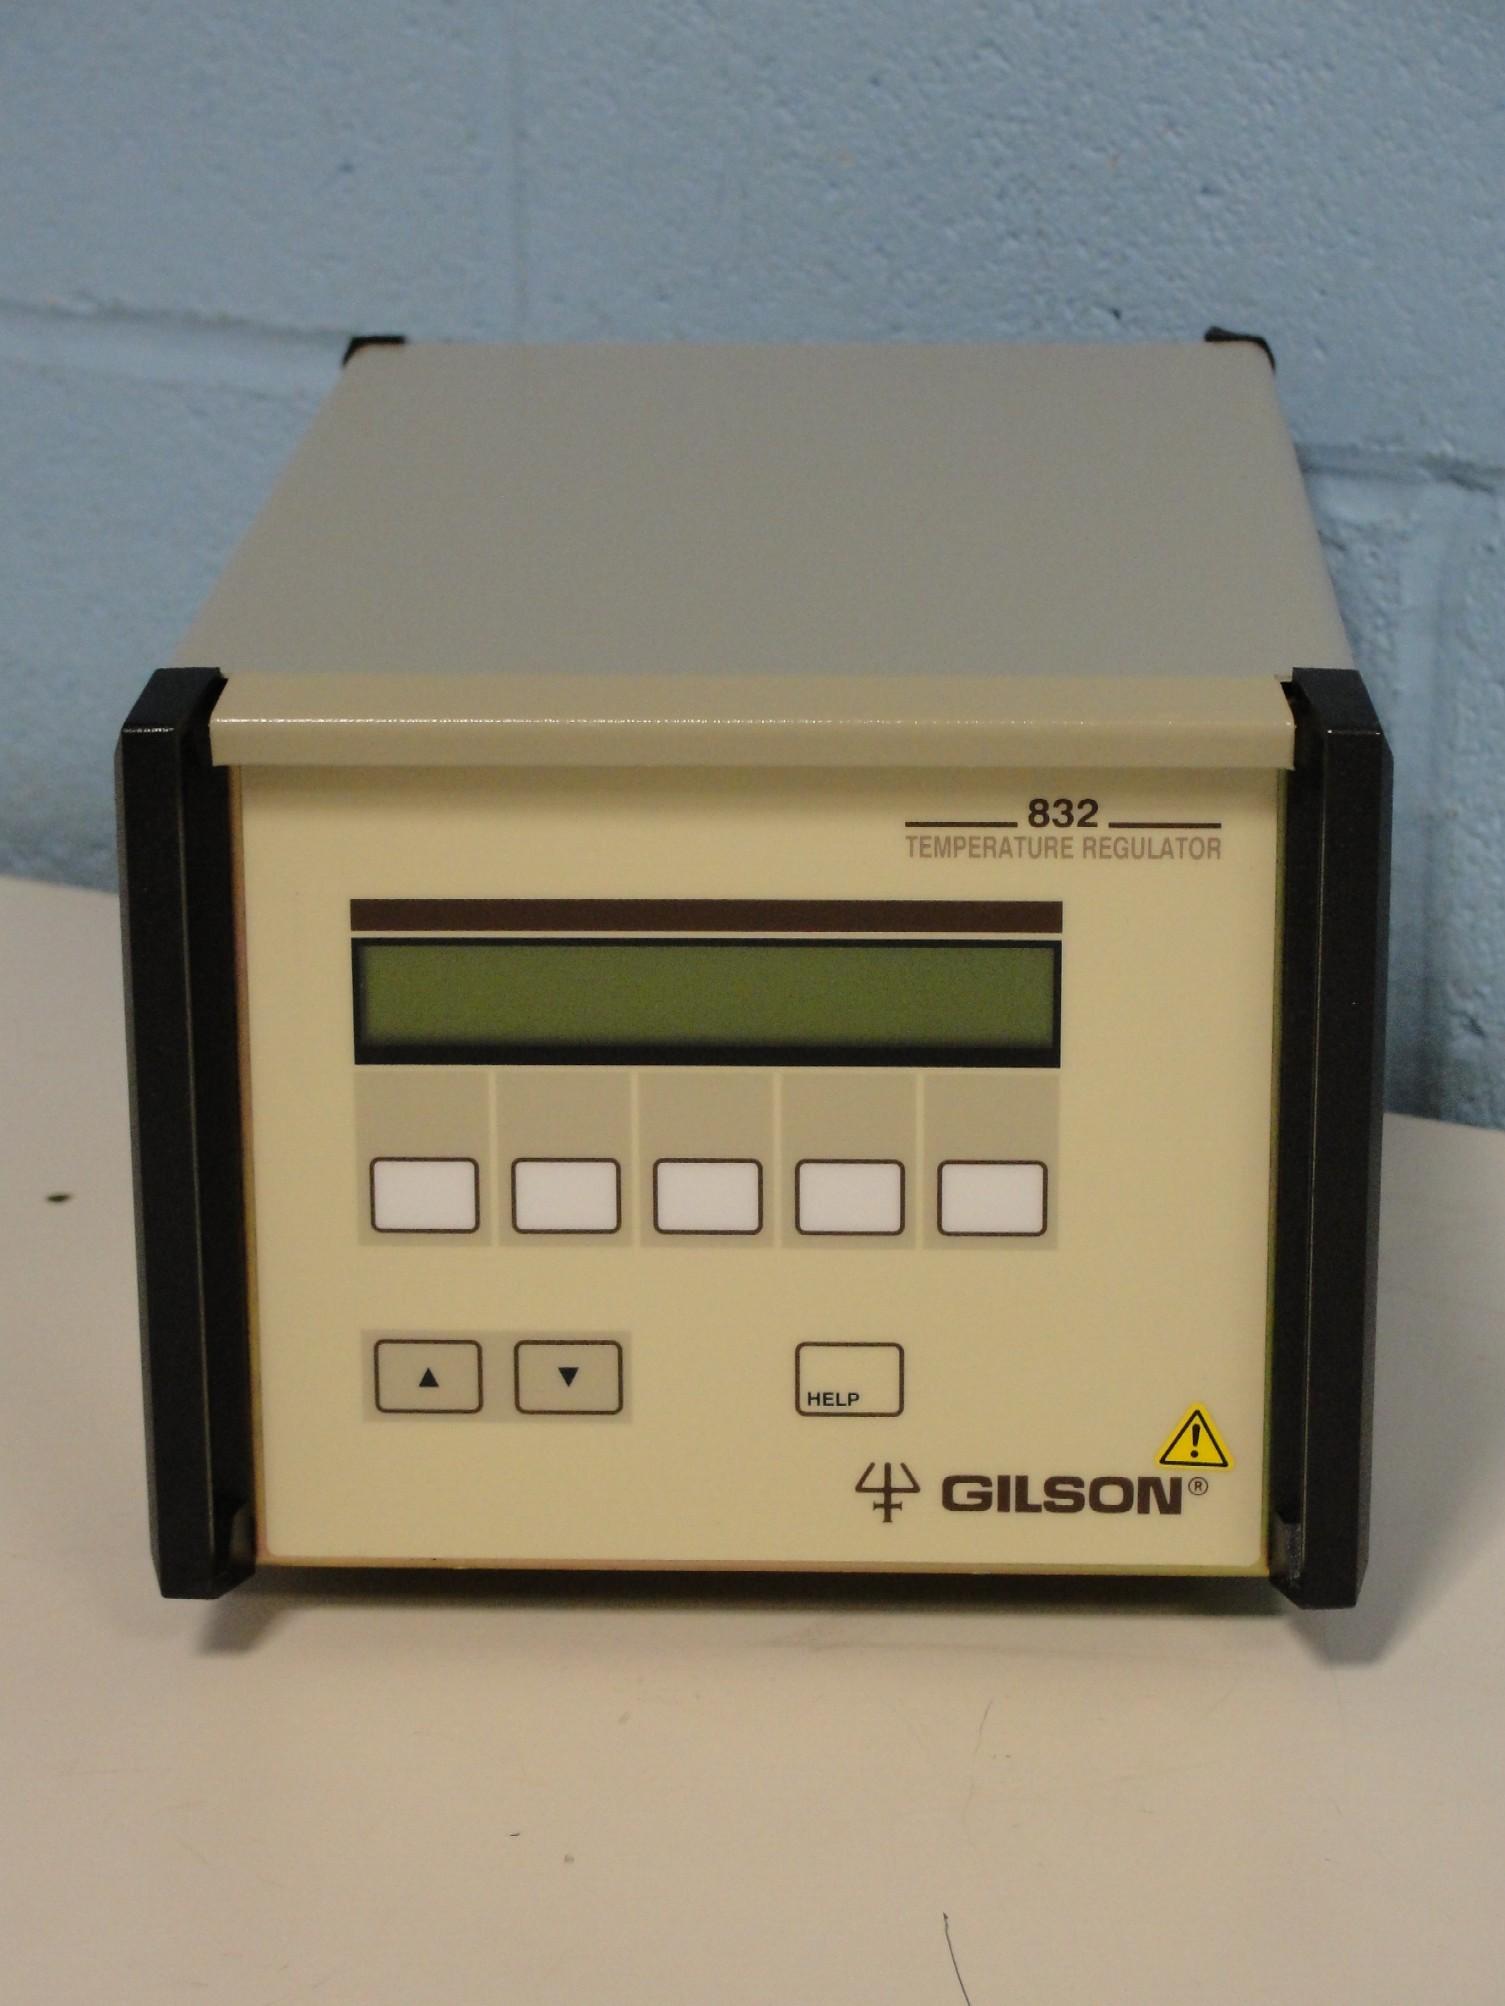 Gilson 832 Temperature Regulator Image